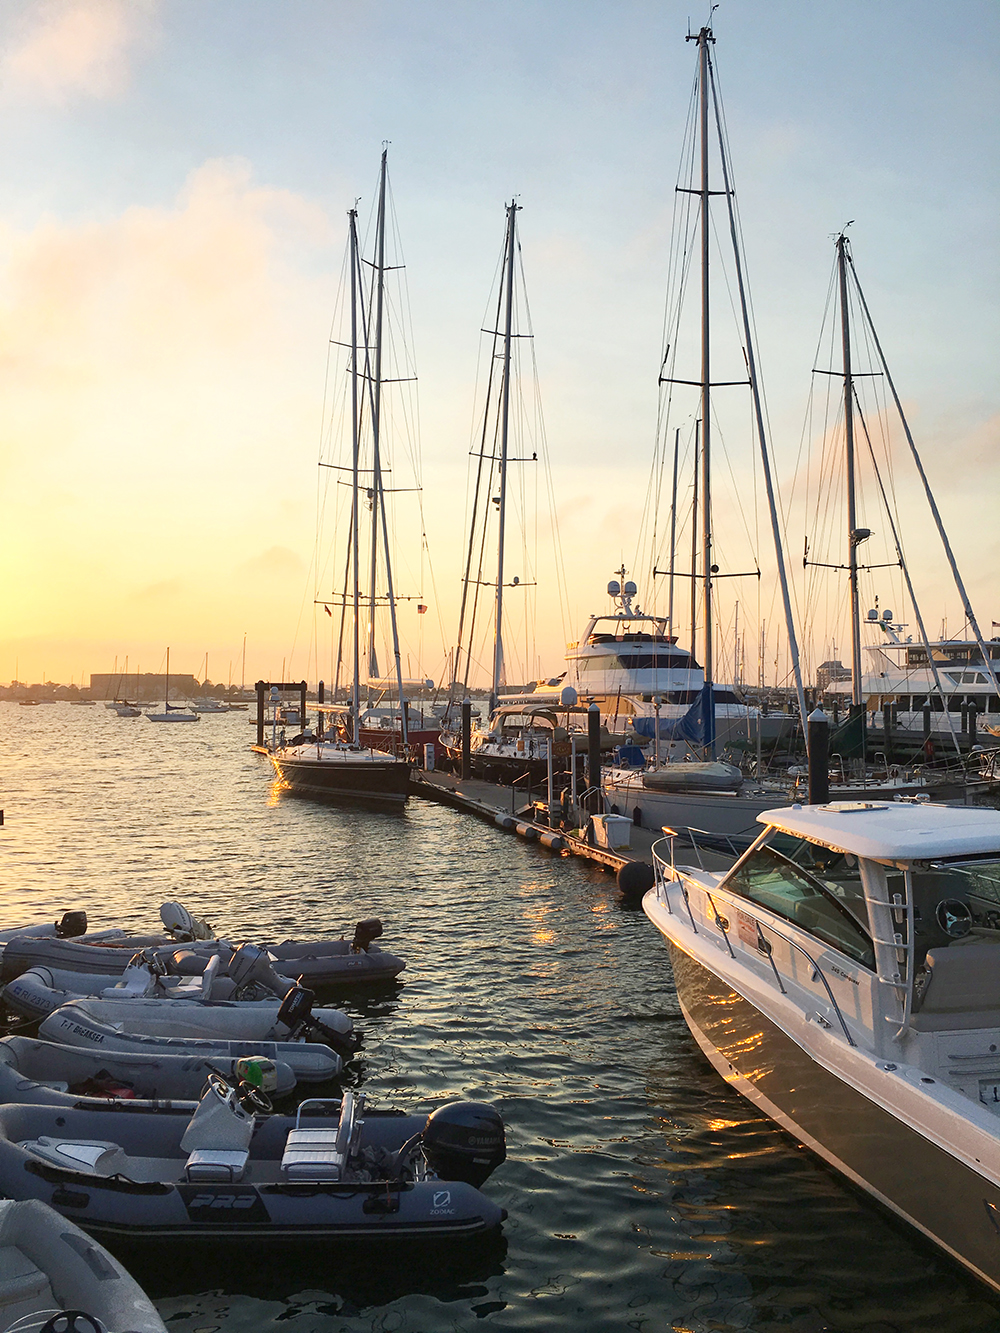 livvyland-blog-olivia-watson-newport-rhode-island-harbor-sailboats-travel-blogger-2